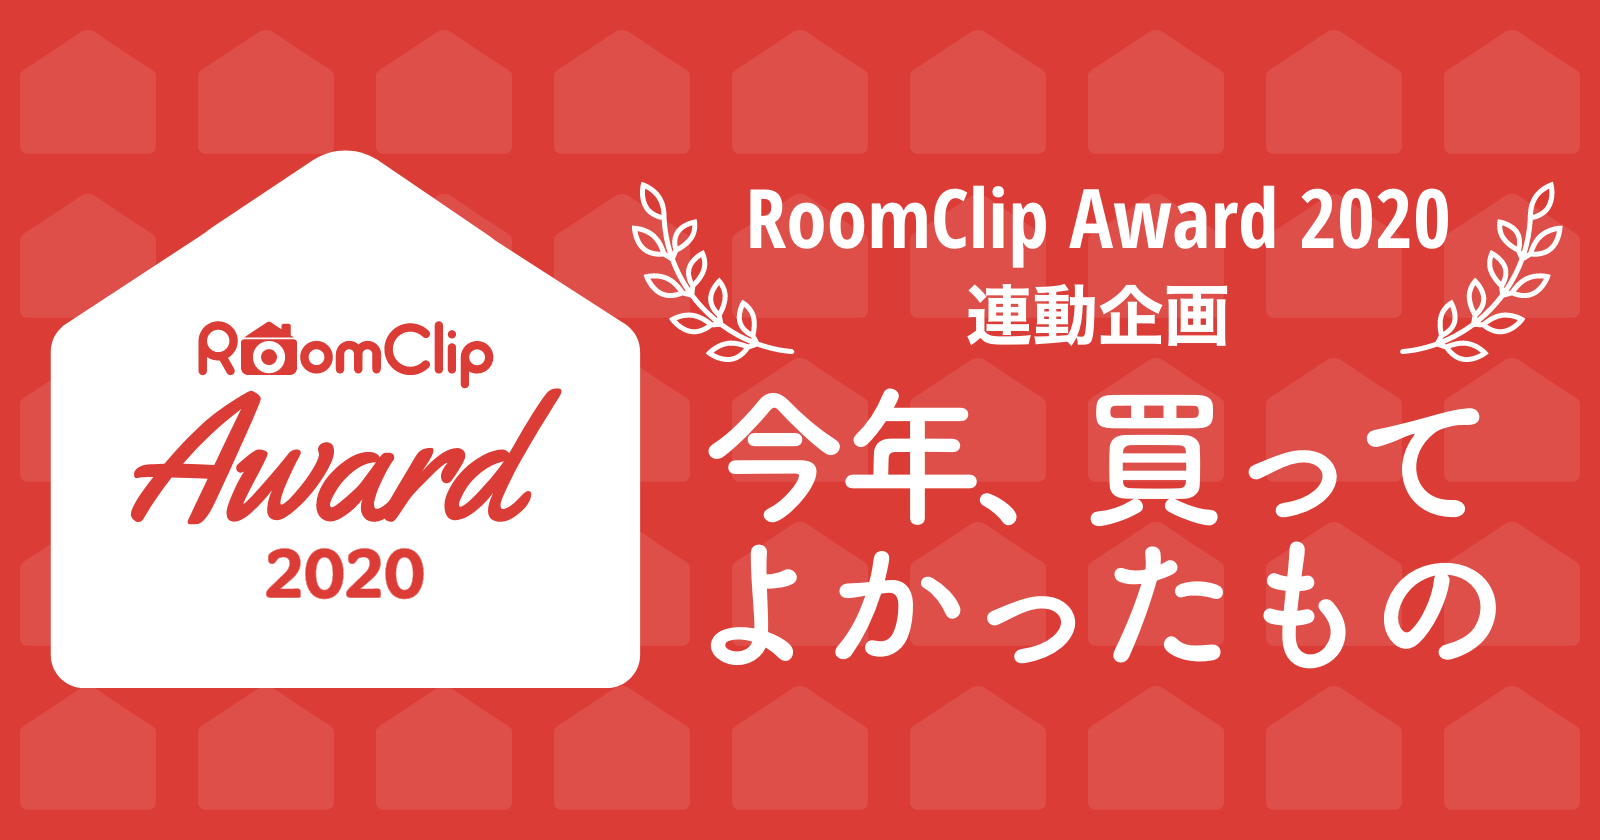 RoomClip Award 2020 連動企画「今年、買ってよかったもの」